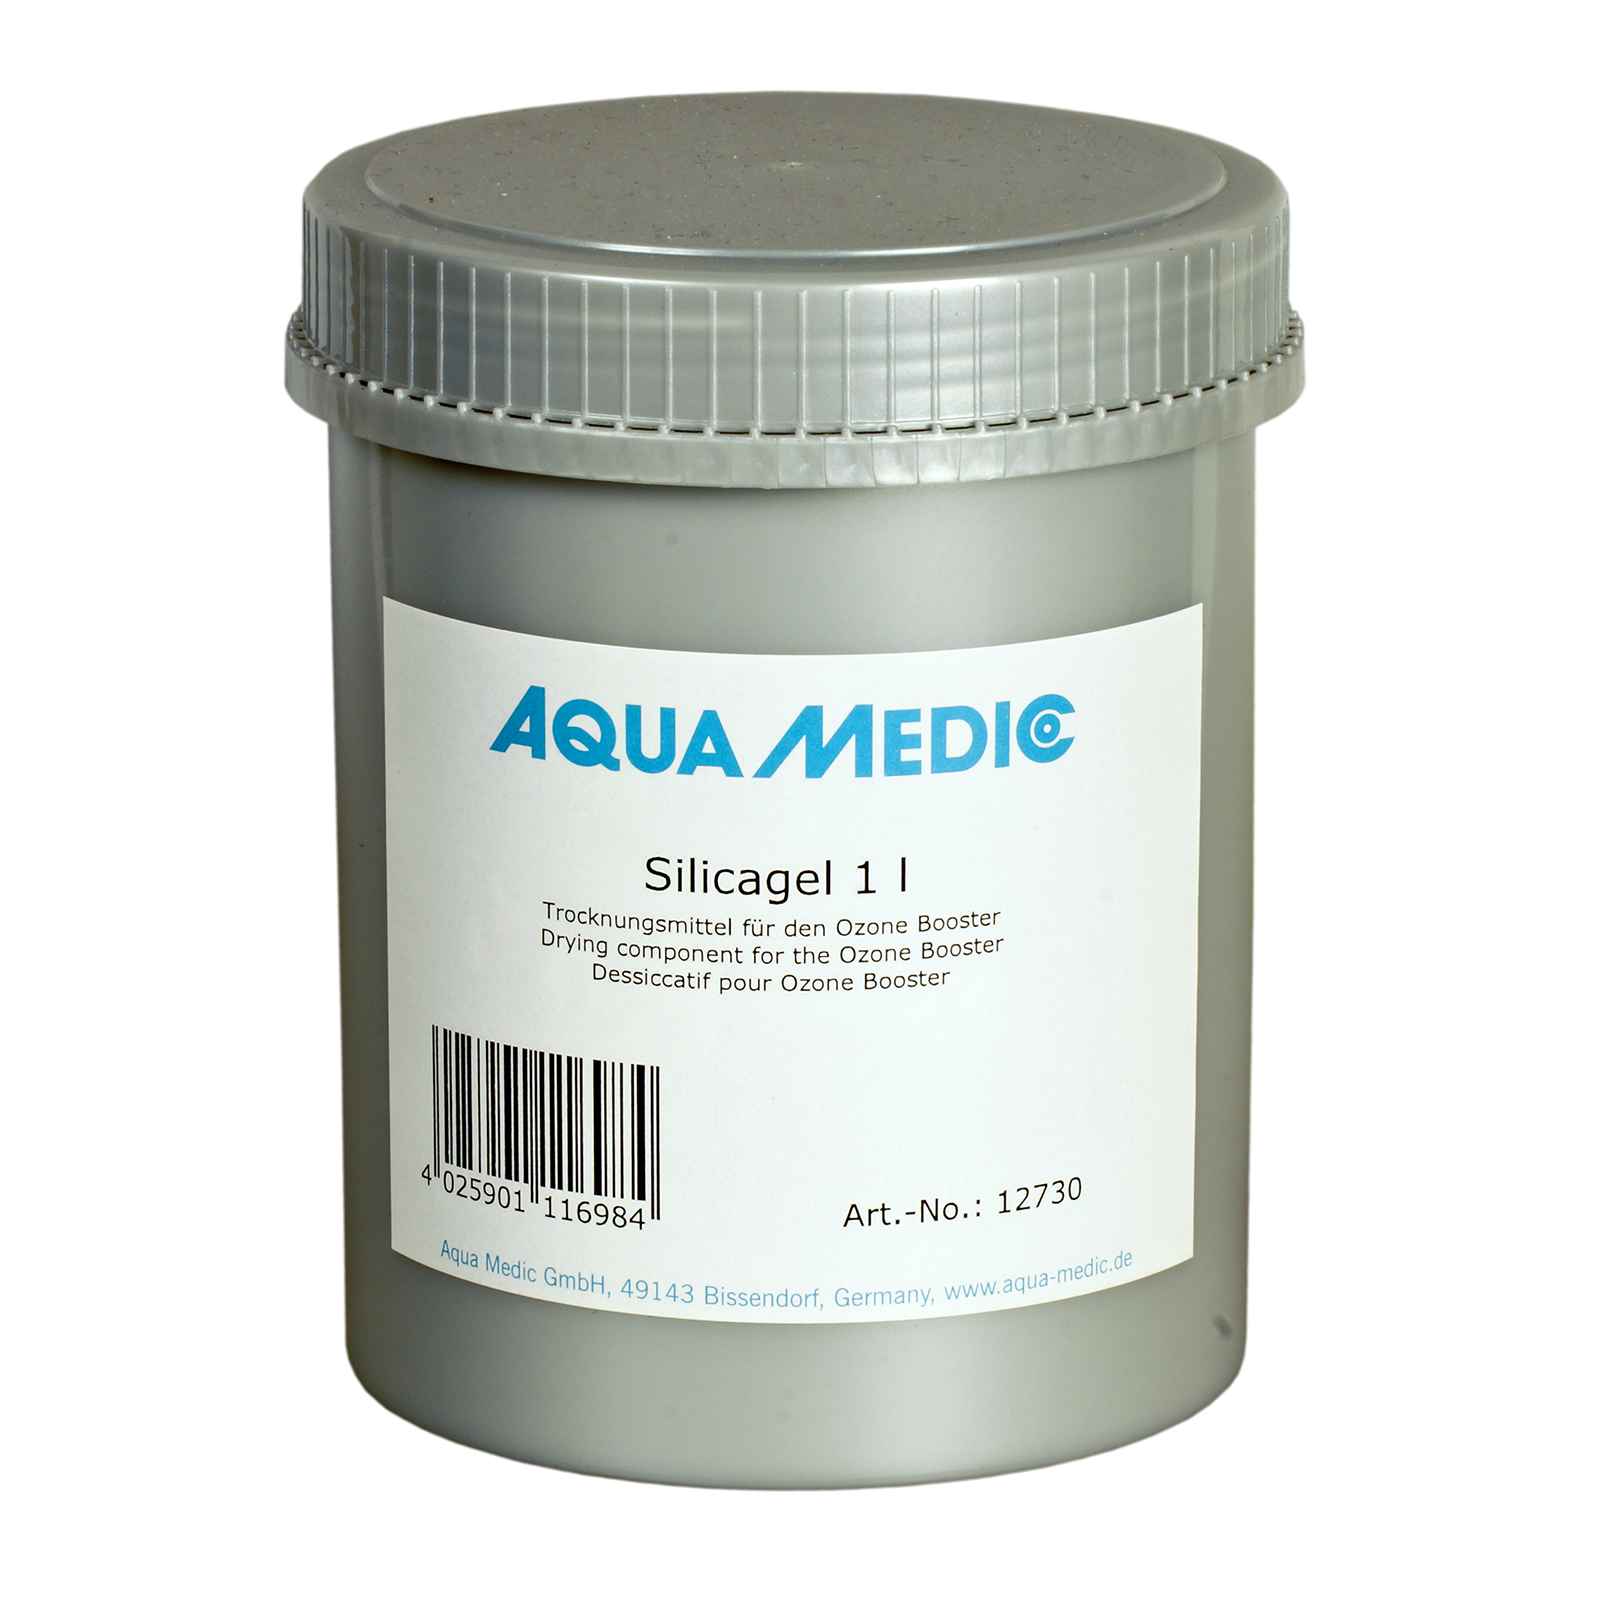 AQUA MEDIC Silicagel 1 L recharge pour appareil Ozone Booster